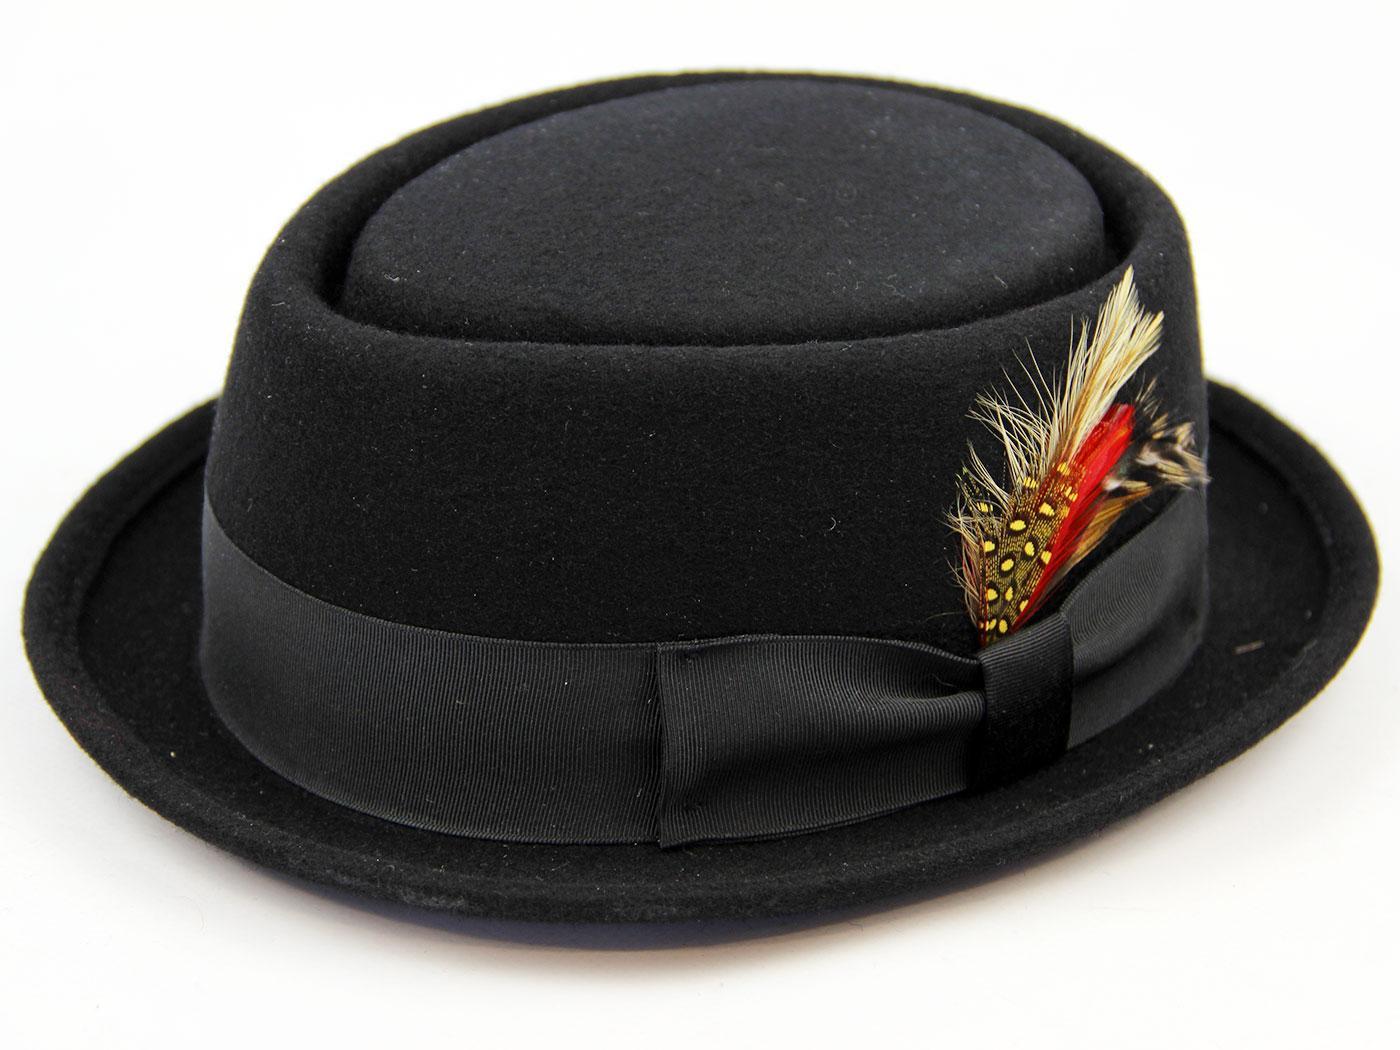 'Be-Bop' Retro Mod Revival Wool Felt Pork Pie Hat